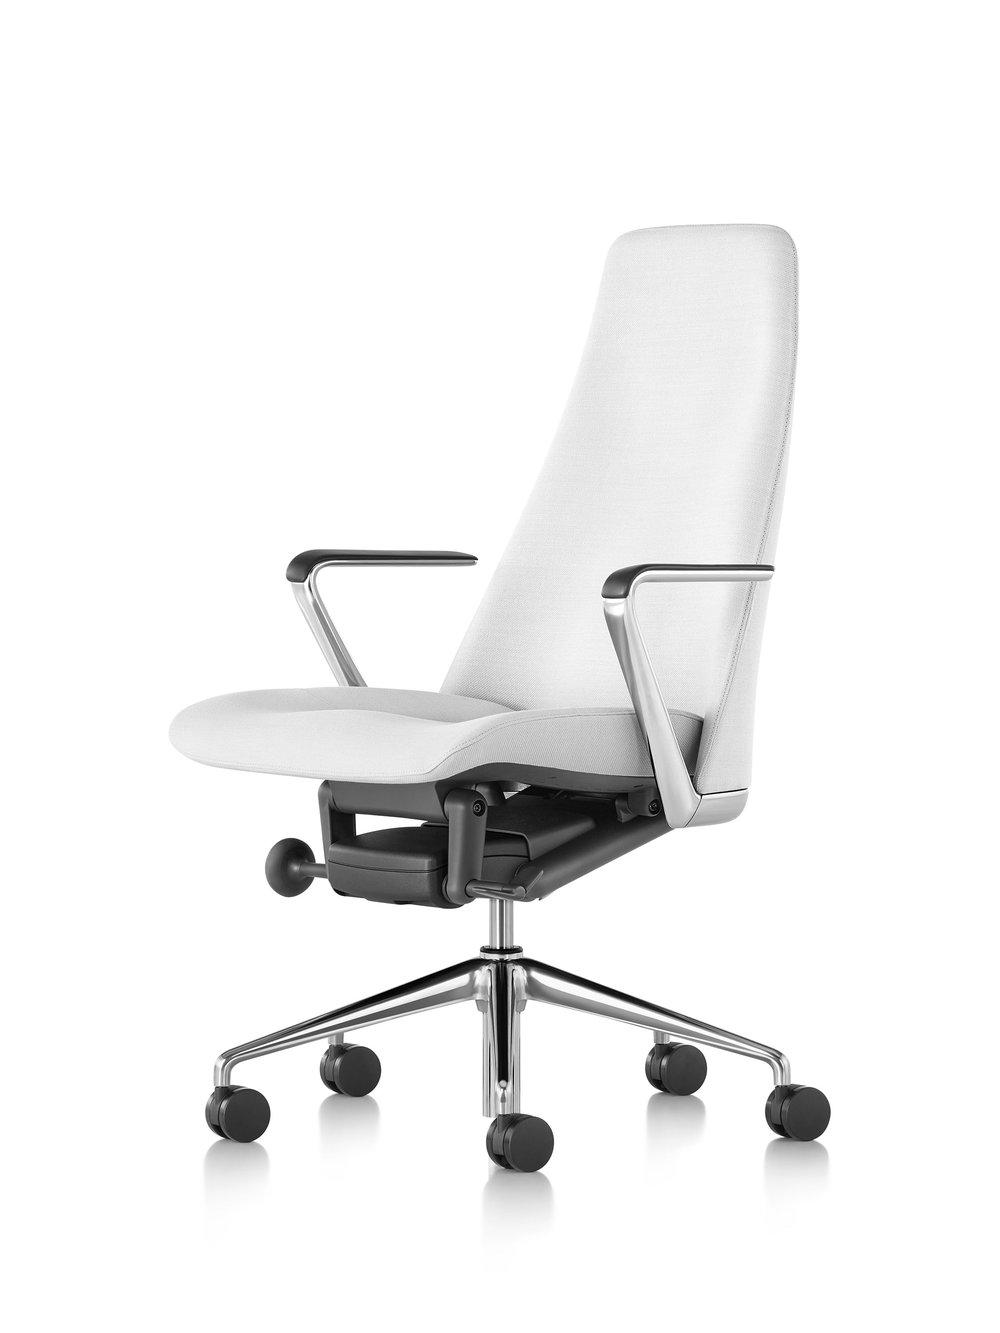 ig_prd_ovw_taper_chair_15.jpg